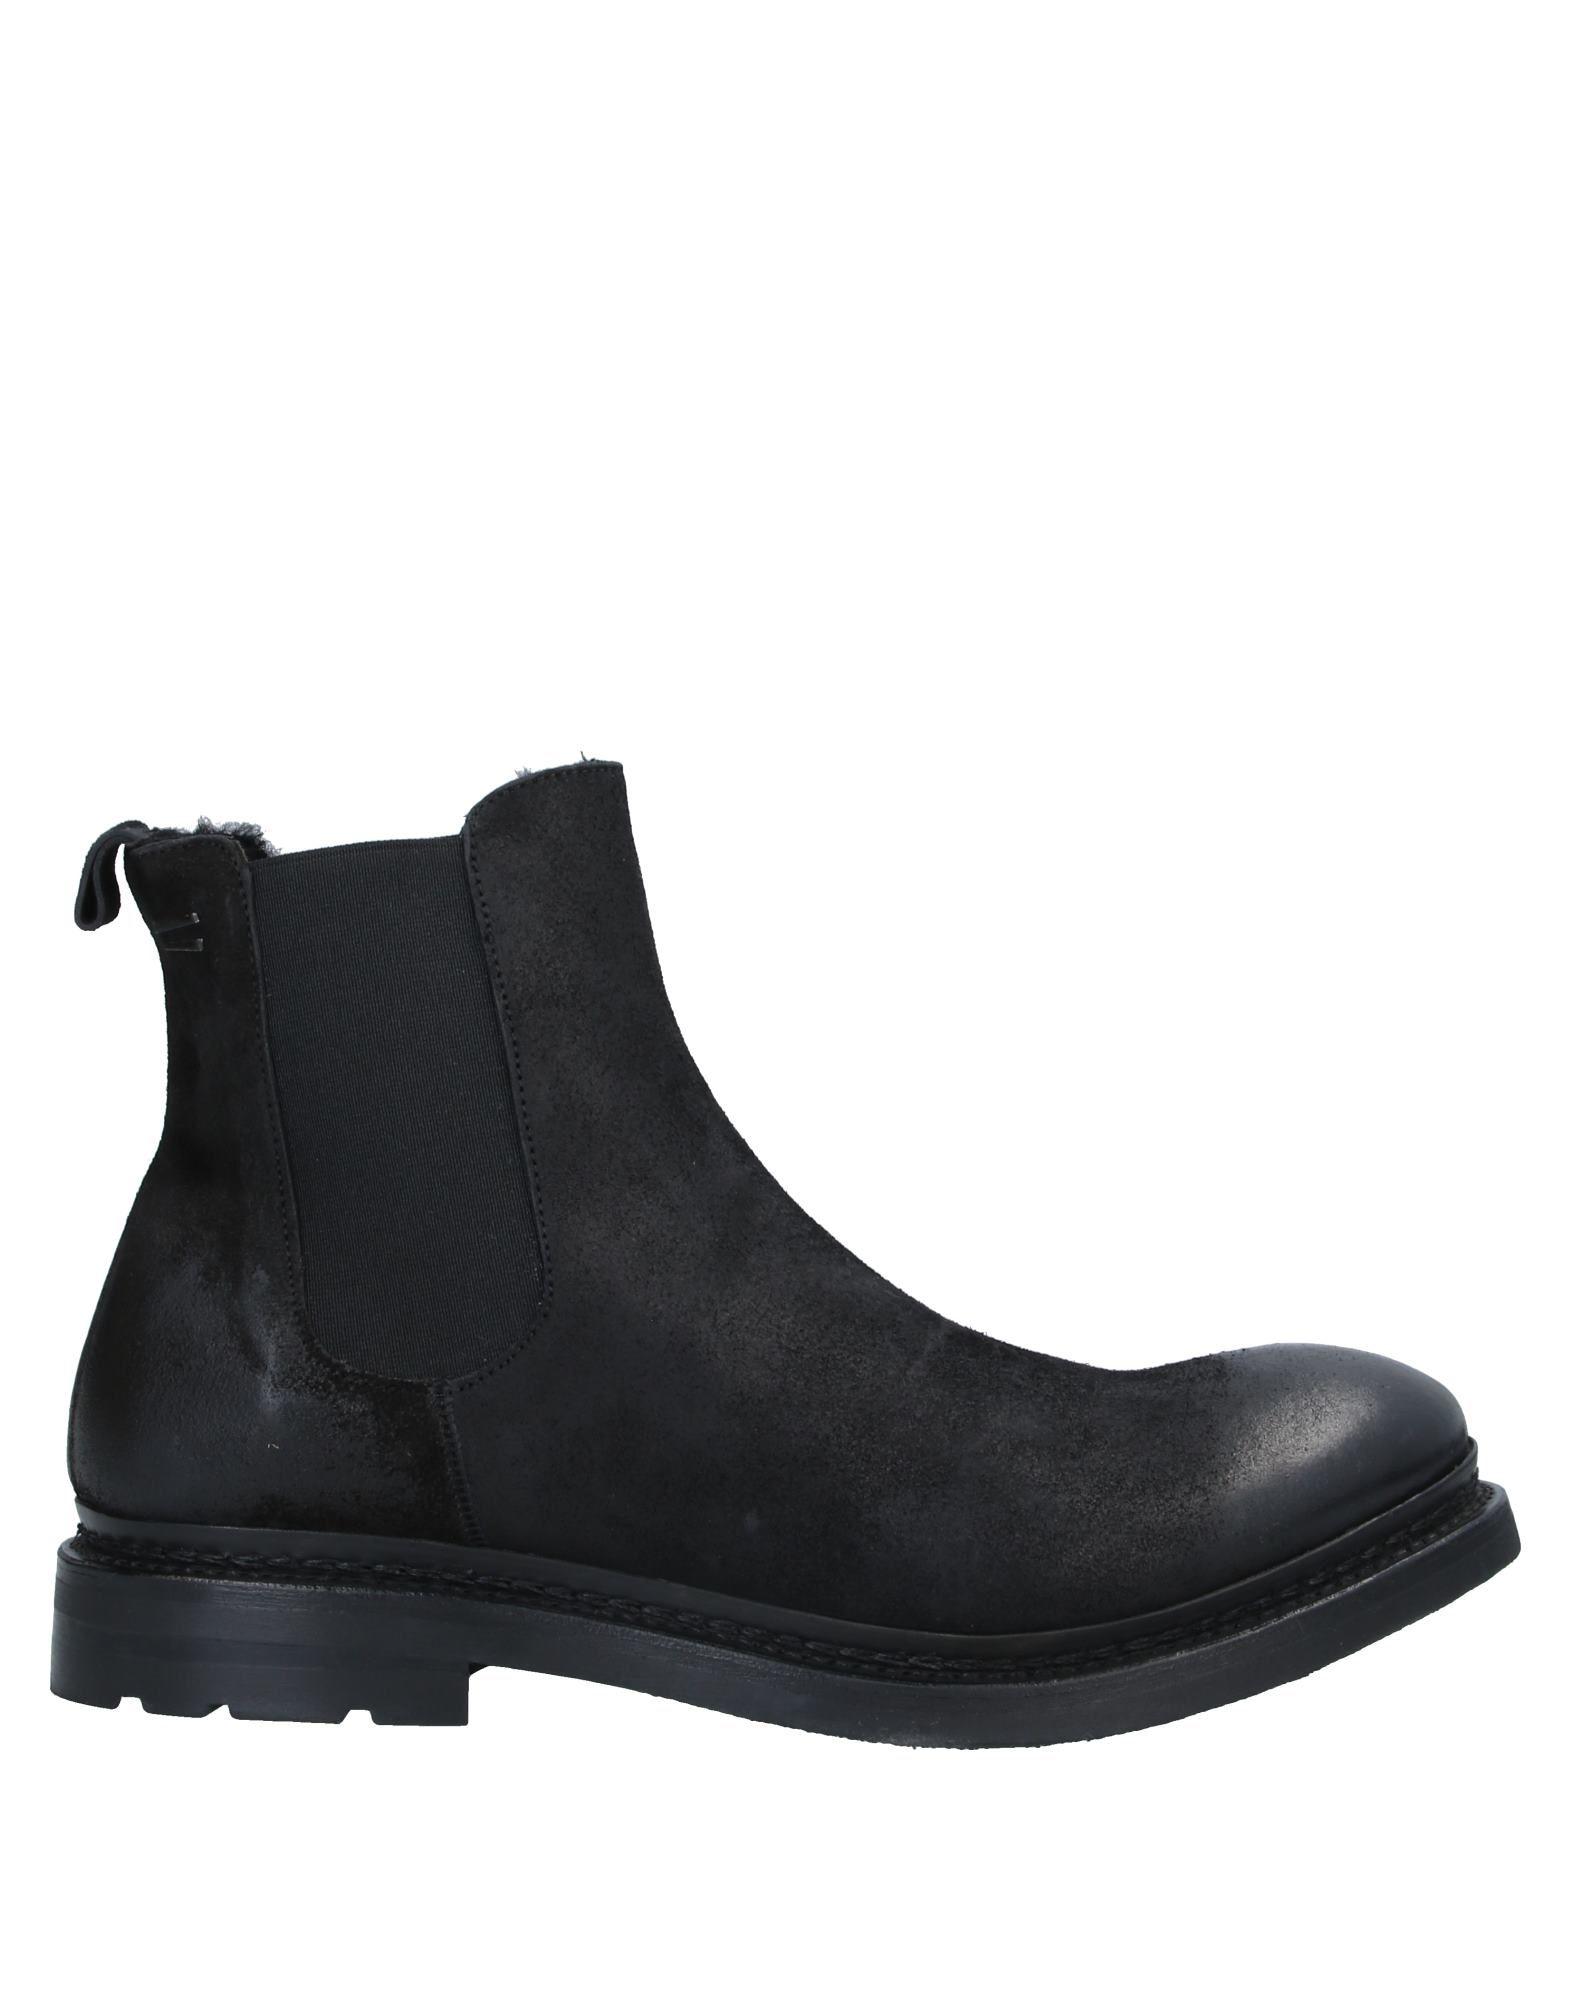 ECCO x THE LAST CONSPIRACY Полусапоги и высокие ботинки ecco® полусапоги и высокие ботинки